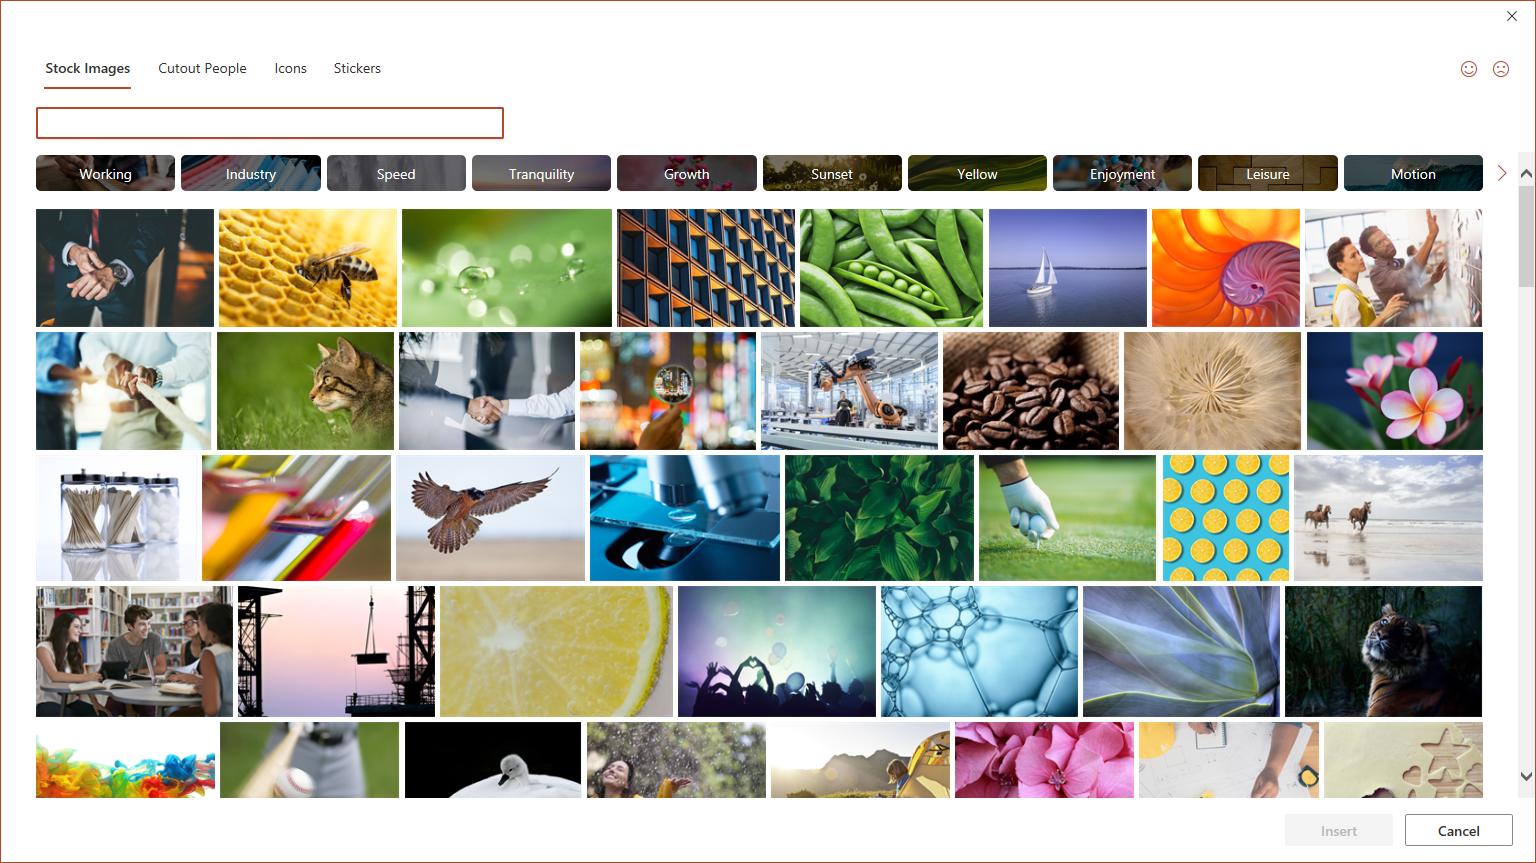 Stock Images dialog box